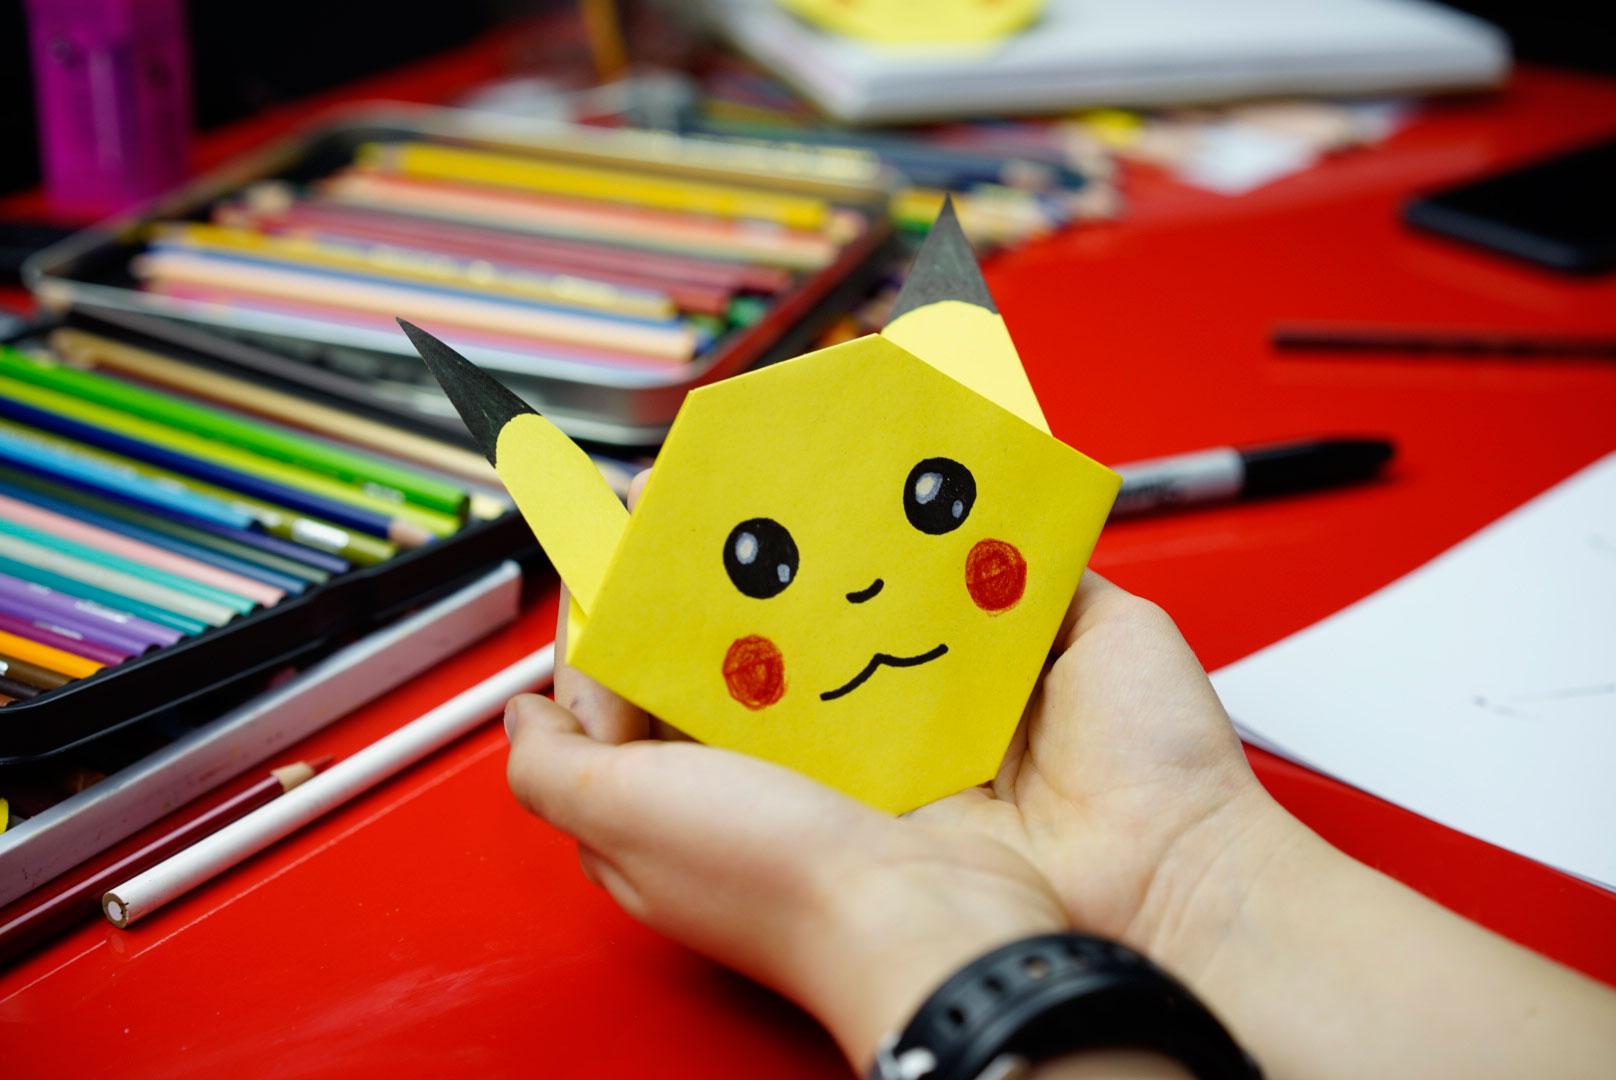 How To Fold Pikachu Origami